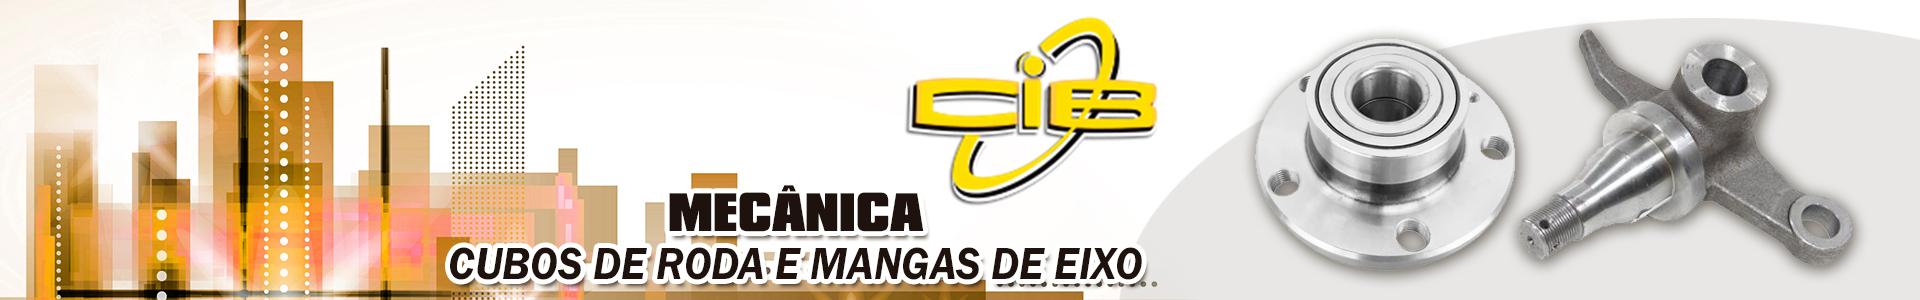 banner-cubos-cib